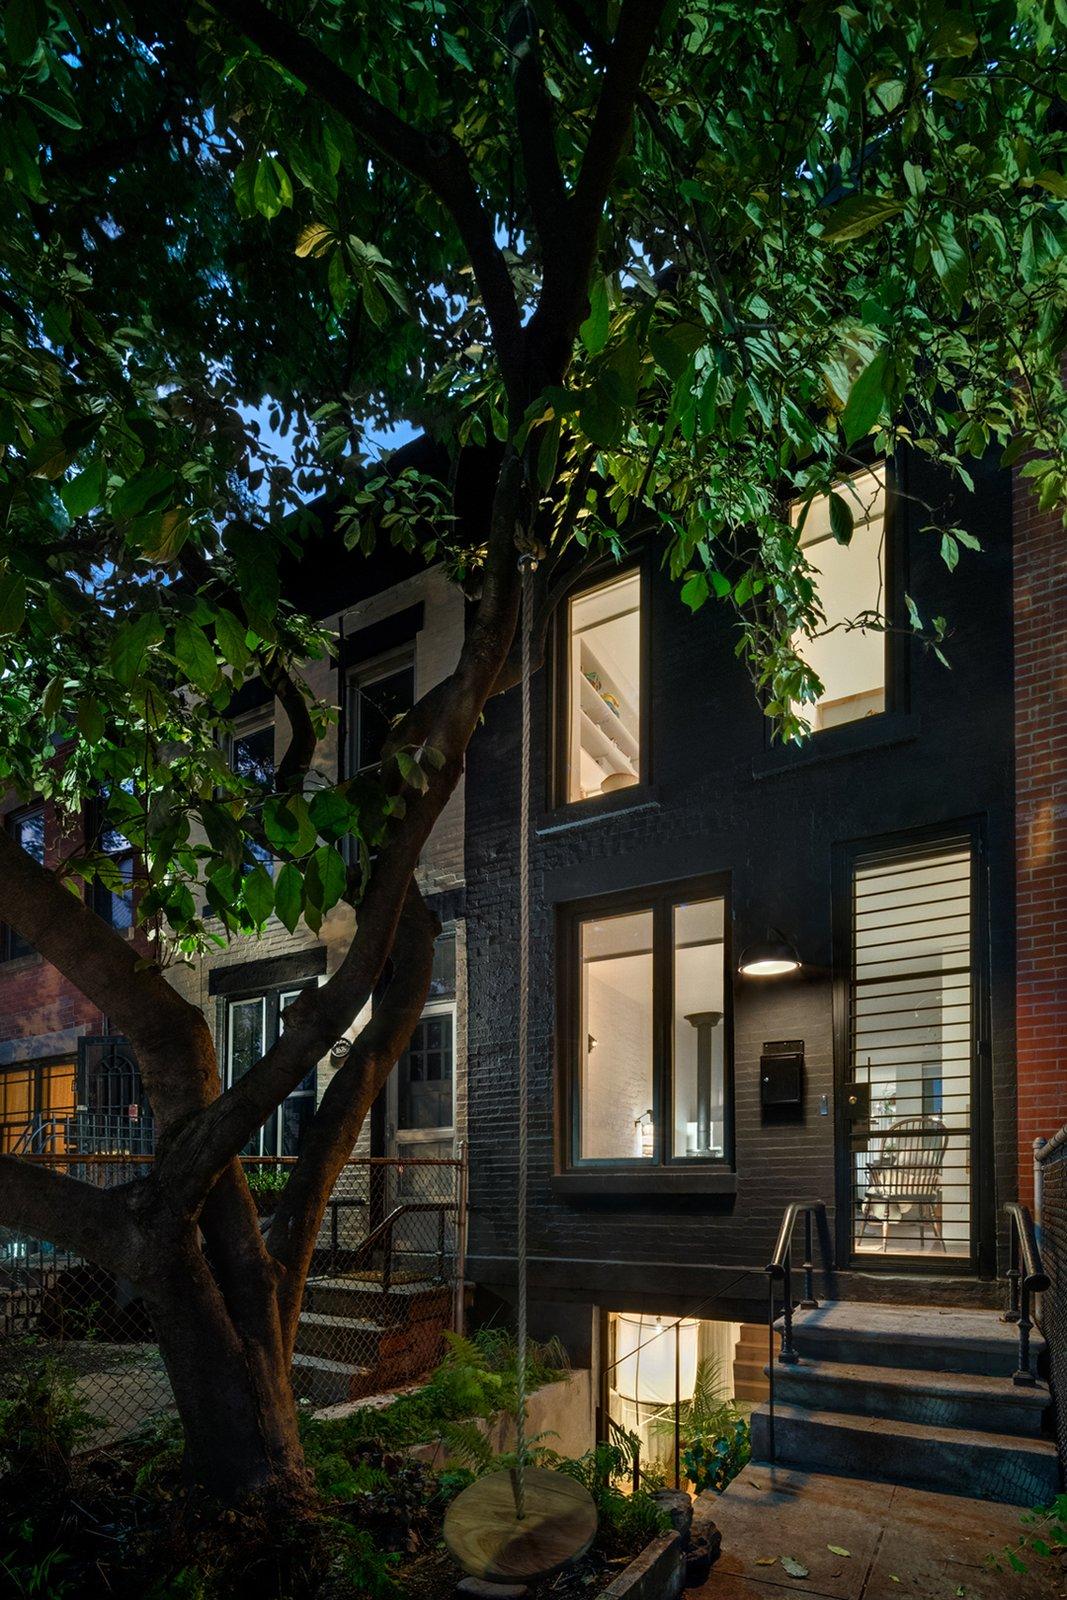 Brooklyn Row 1